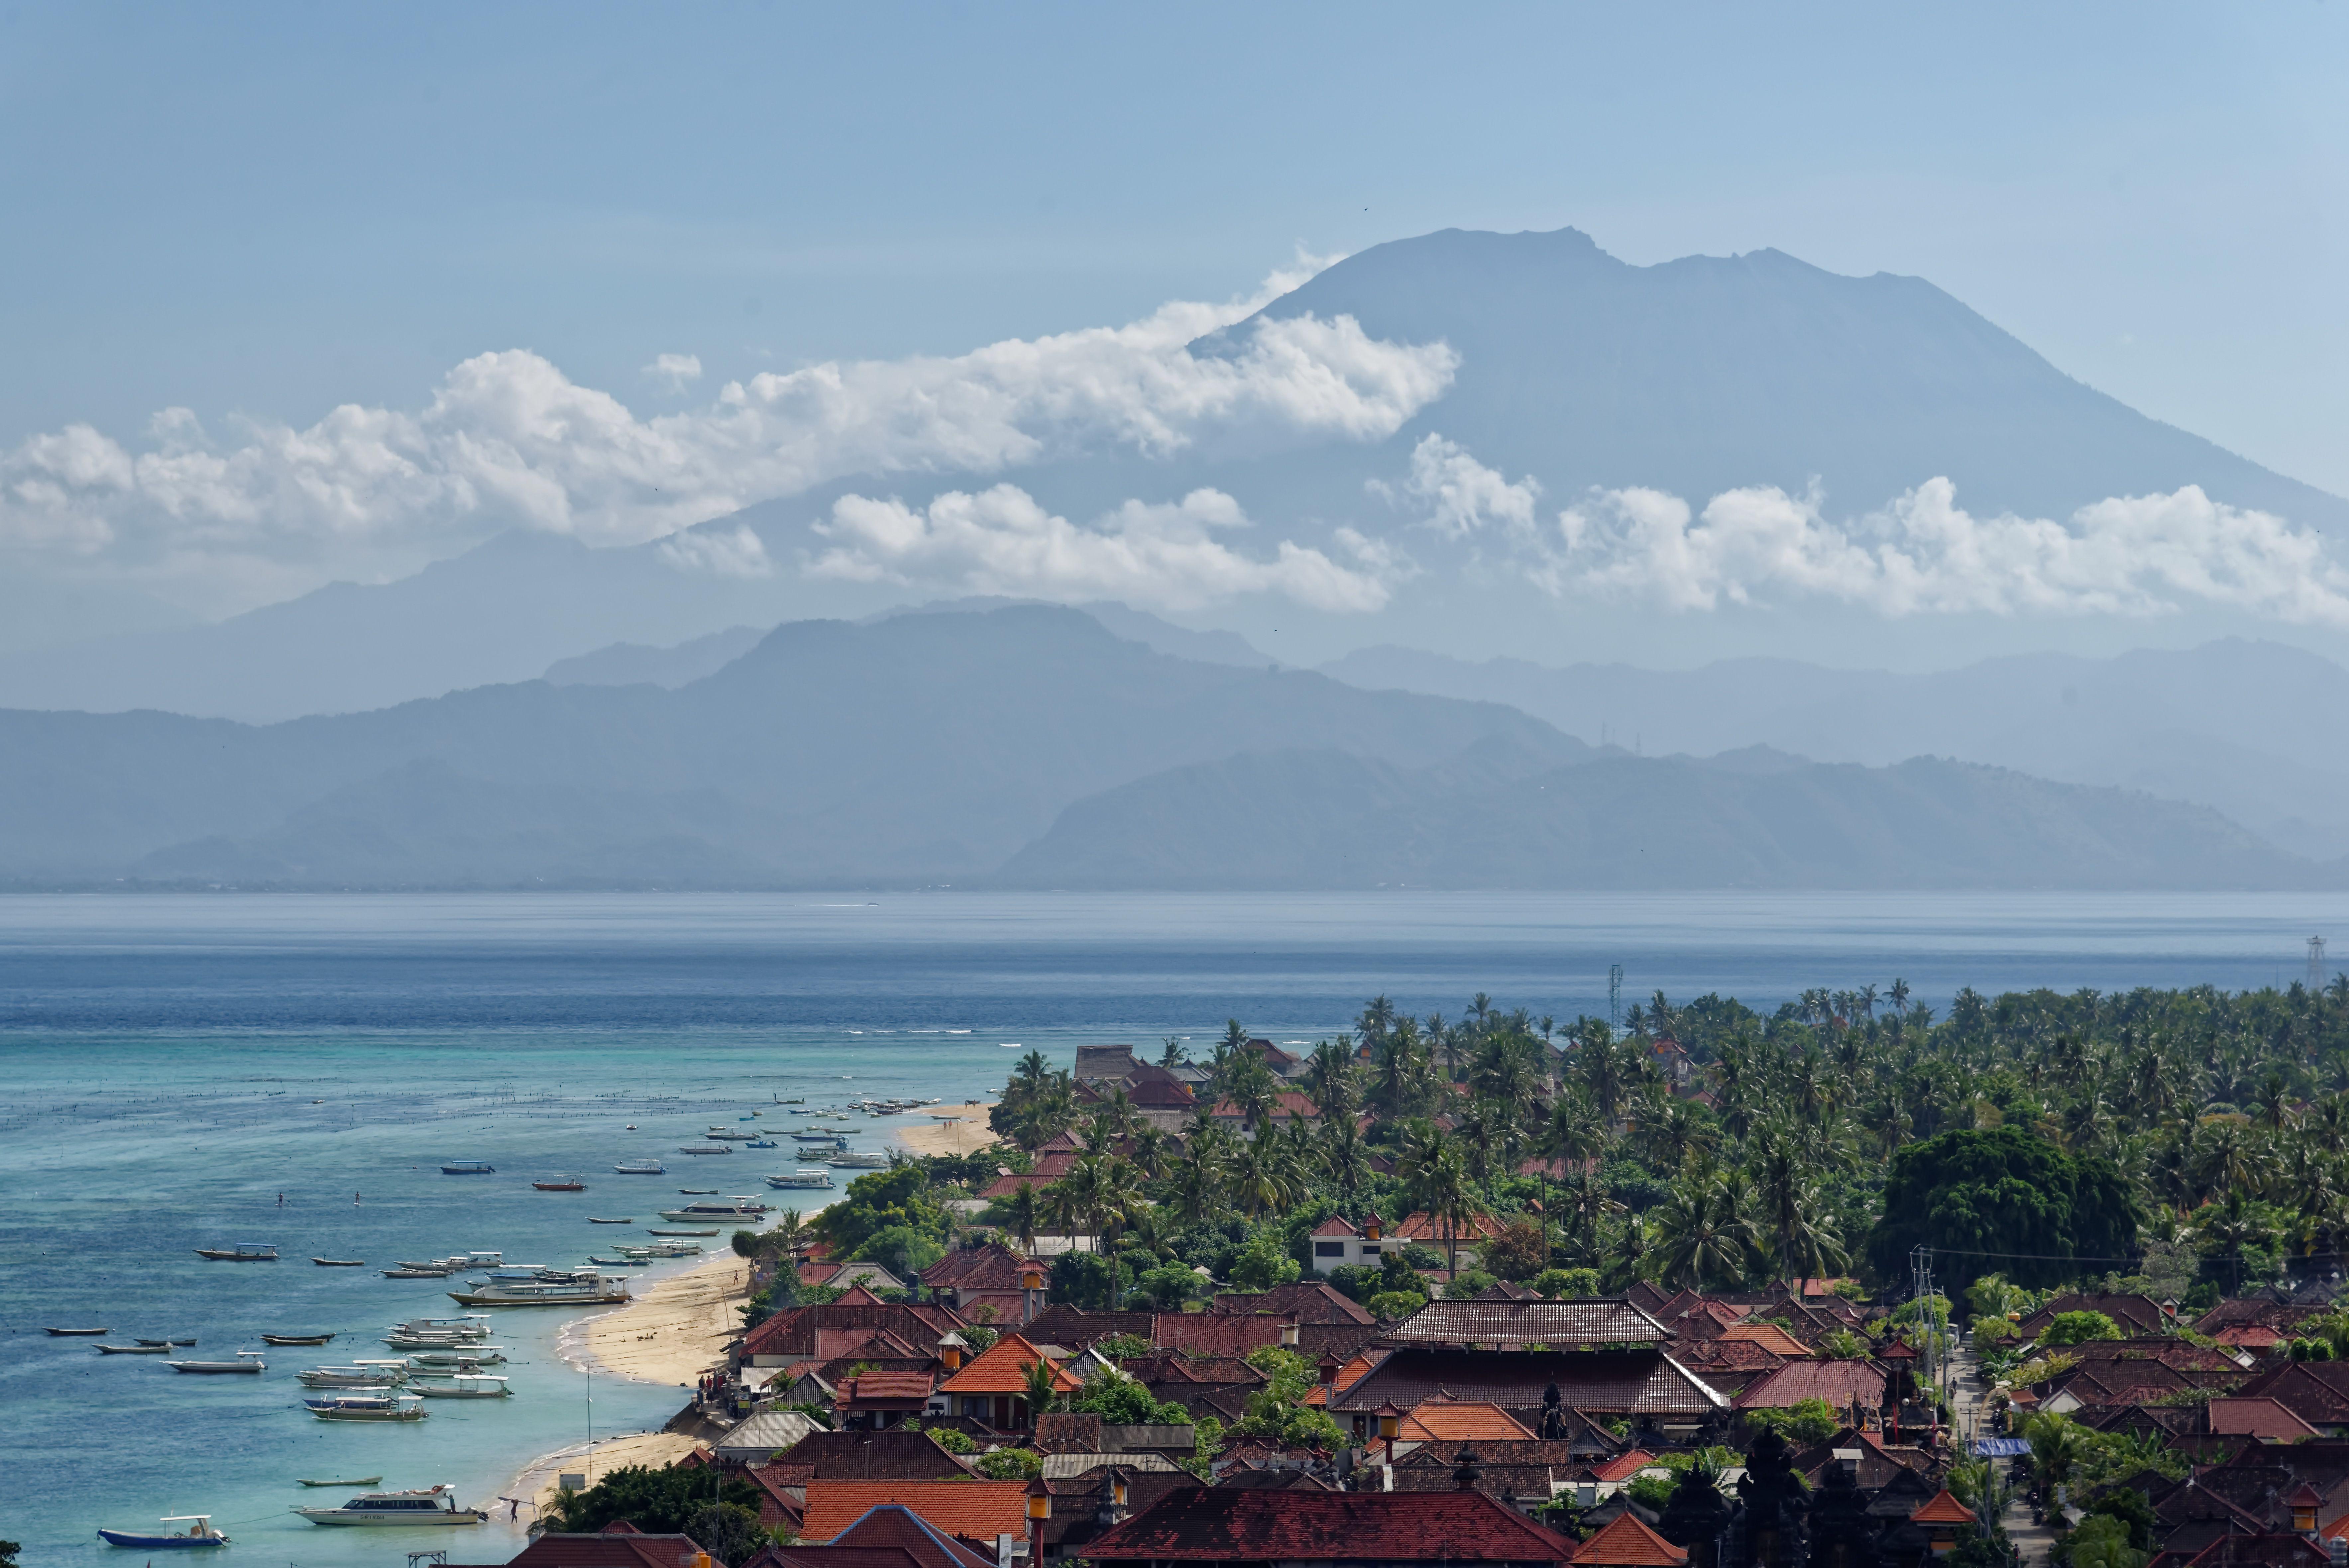 Mount Agung and Jungut Batu Village